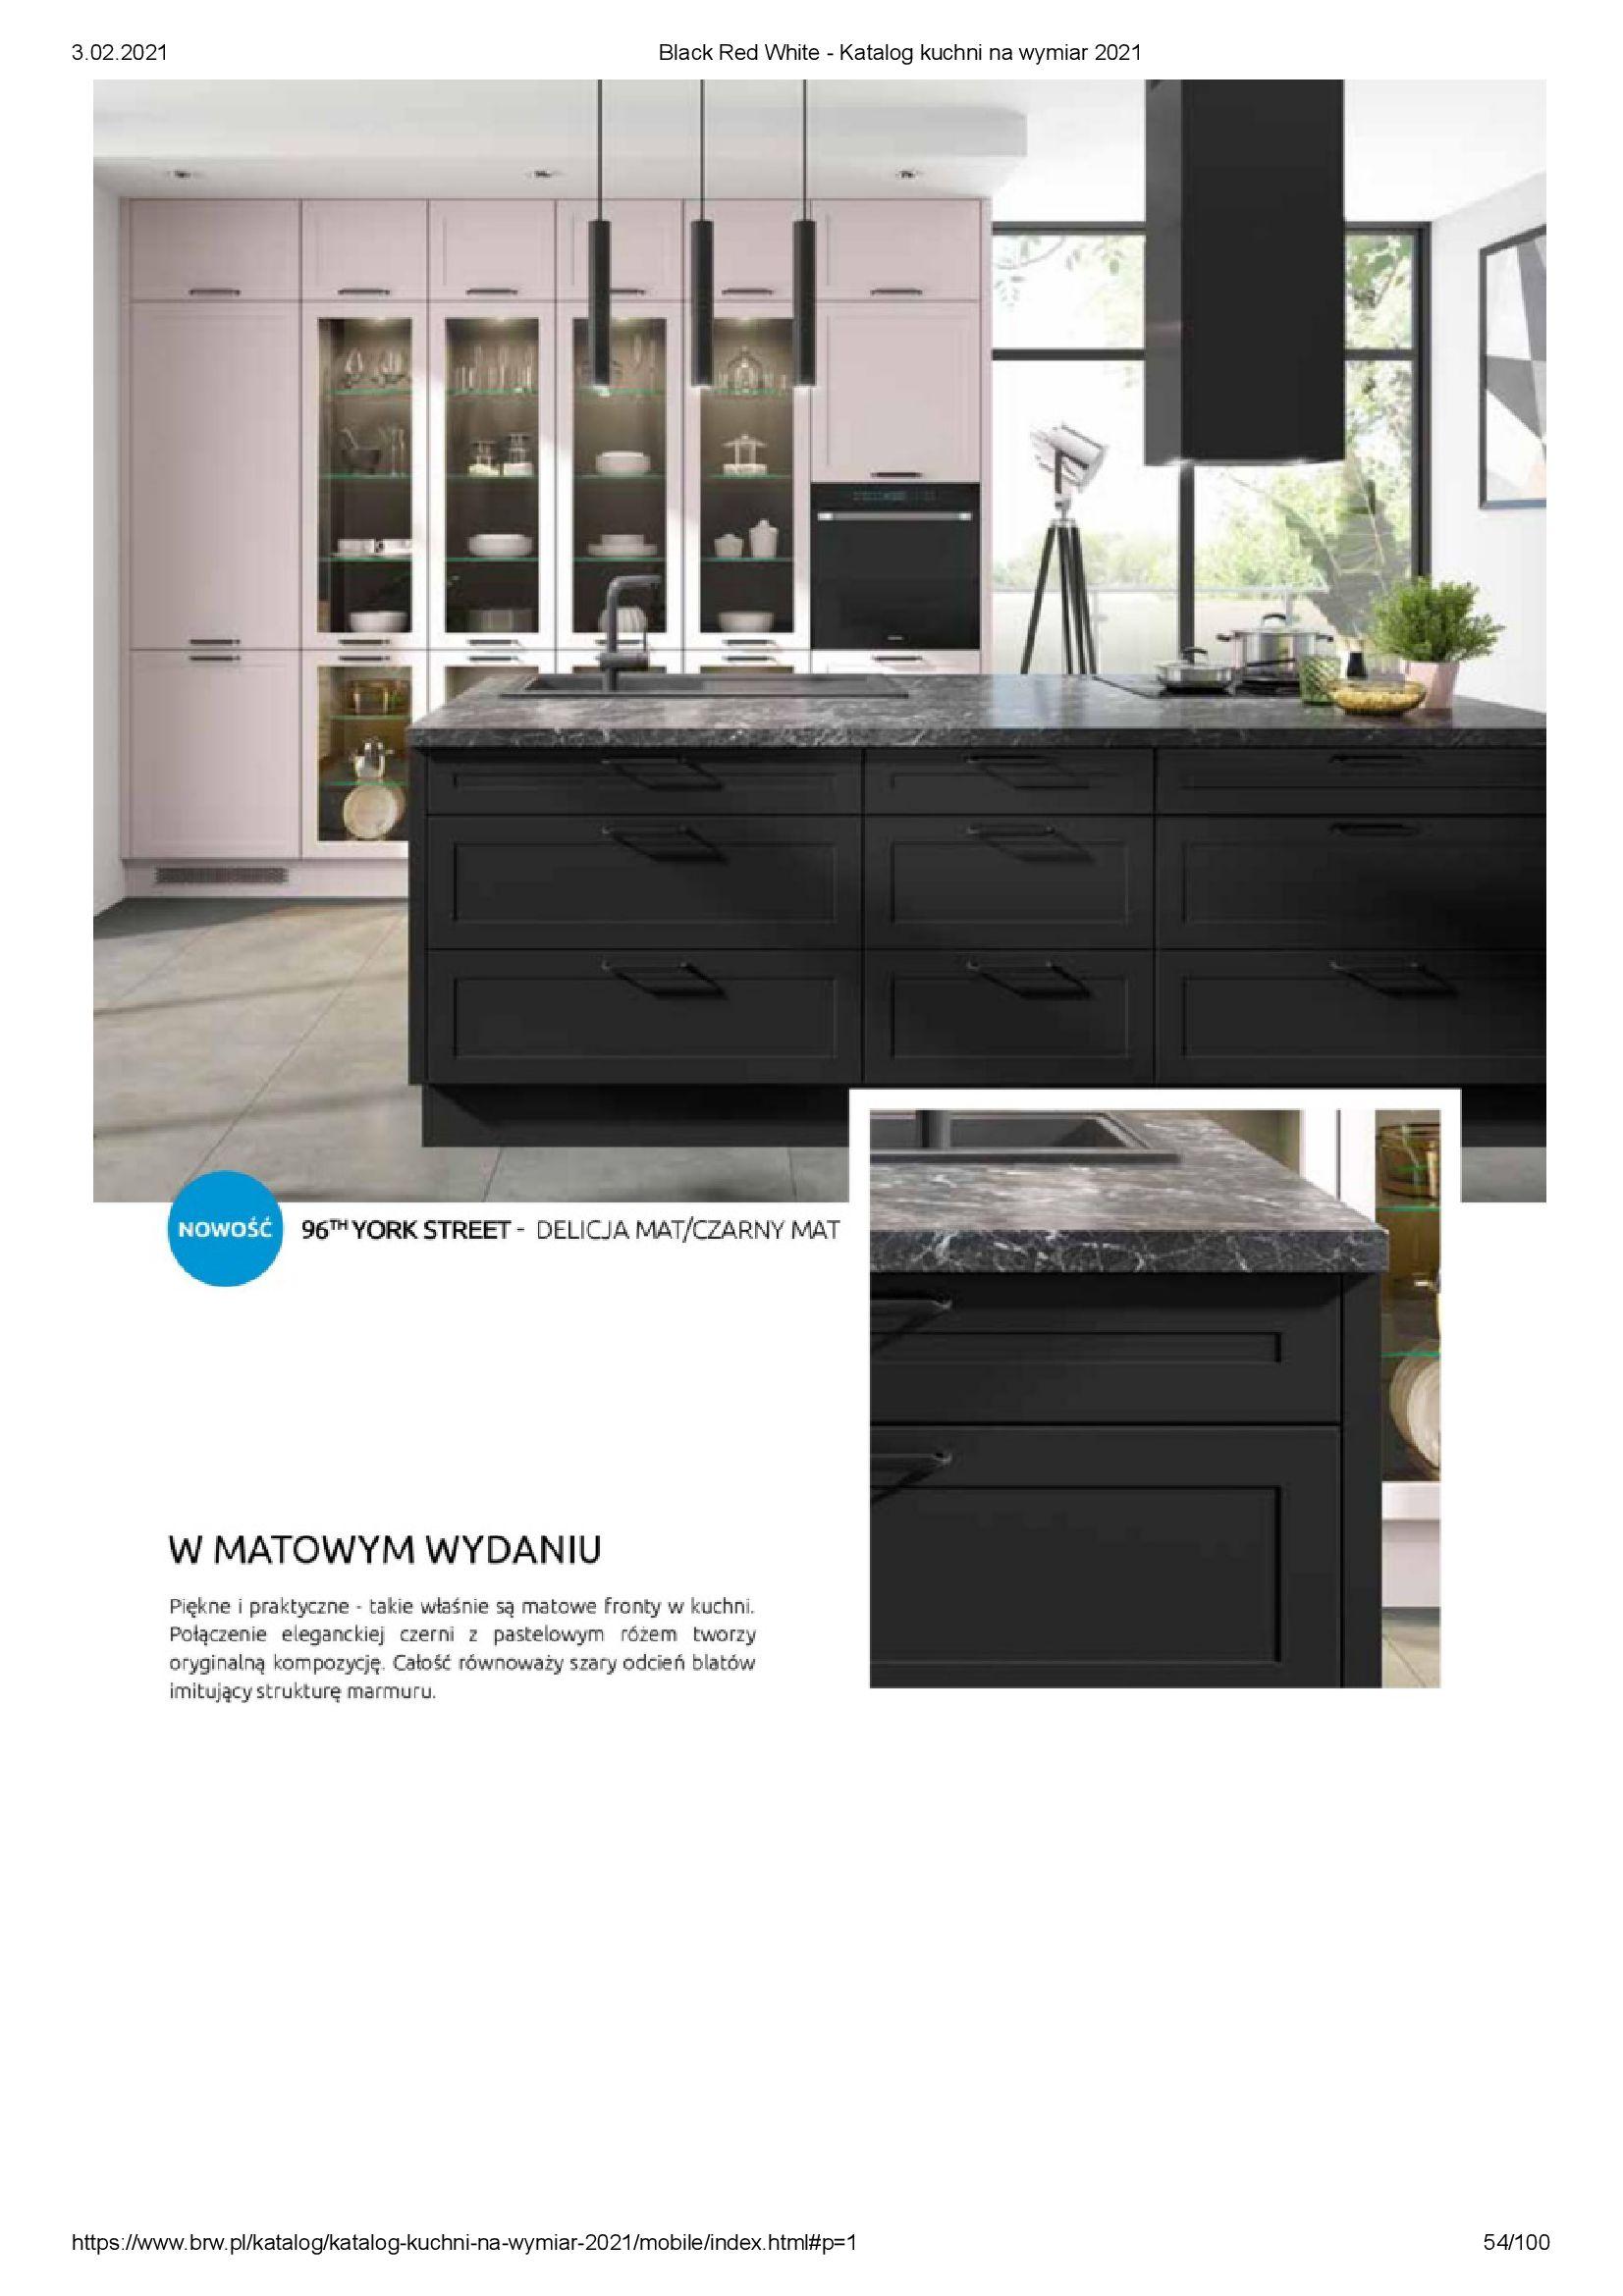 Gazetka Black Red White: Katalog - Kuchnie na wymiar Senso Kitchens 2021 2021-01-01 page-54